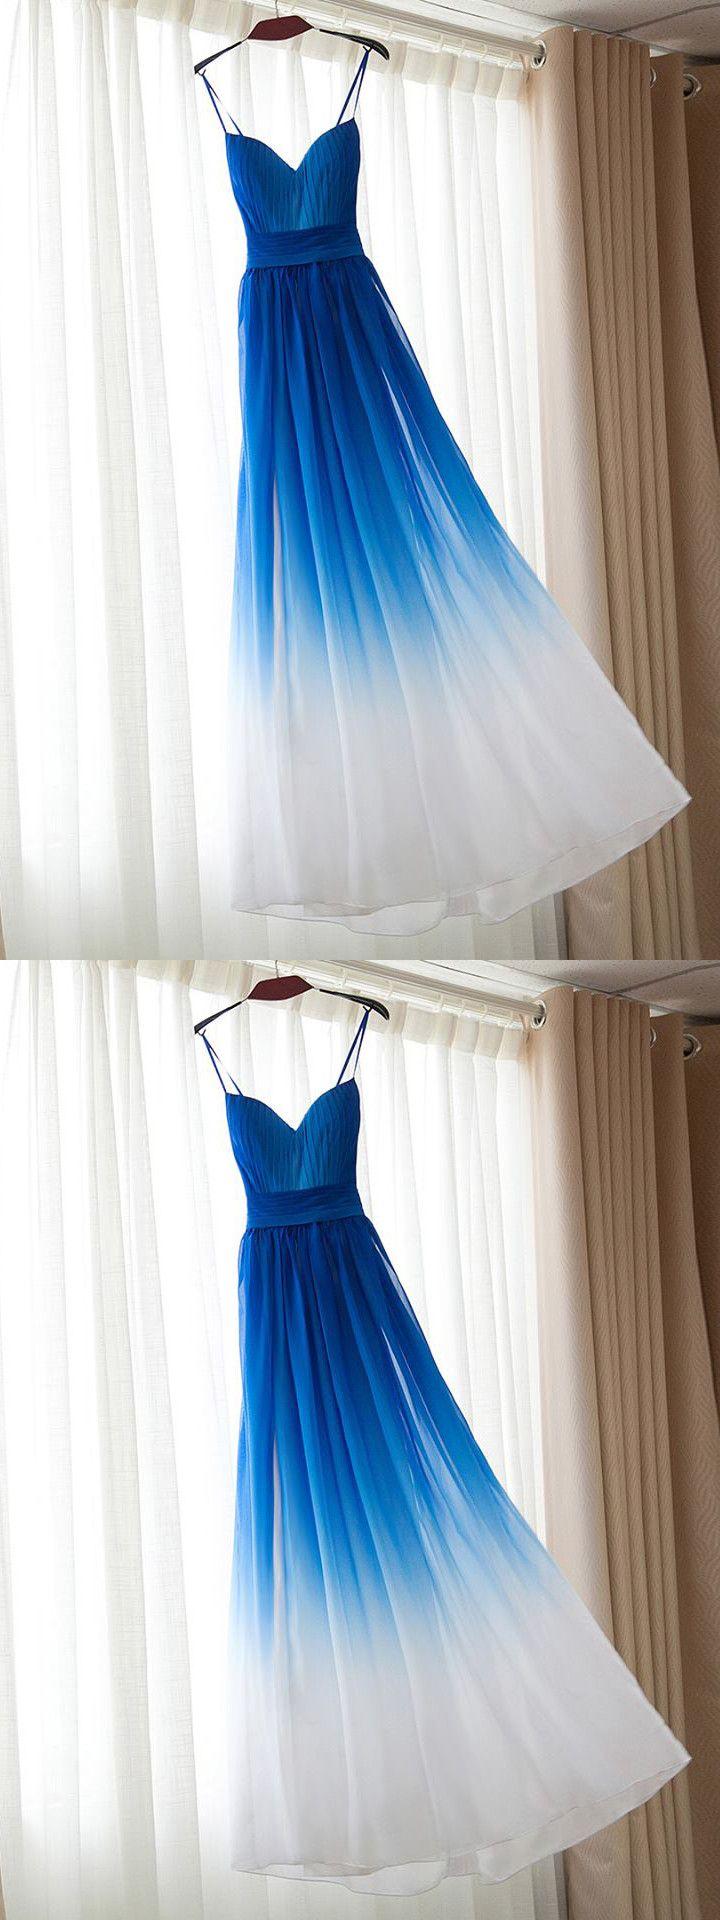 Prom dresses ombre prom dressesprom dresses uniqueprom